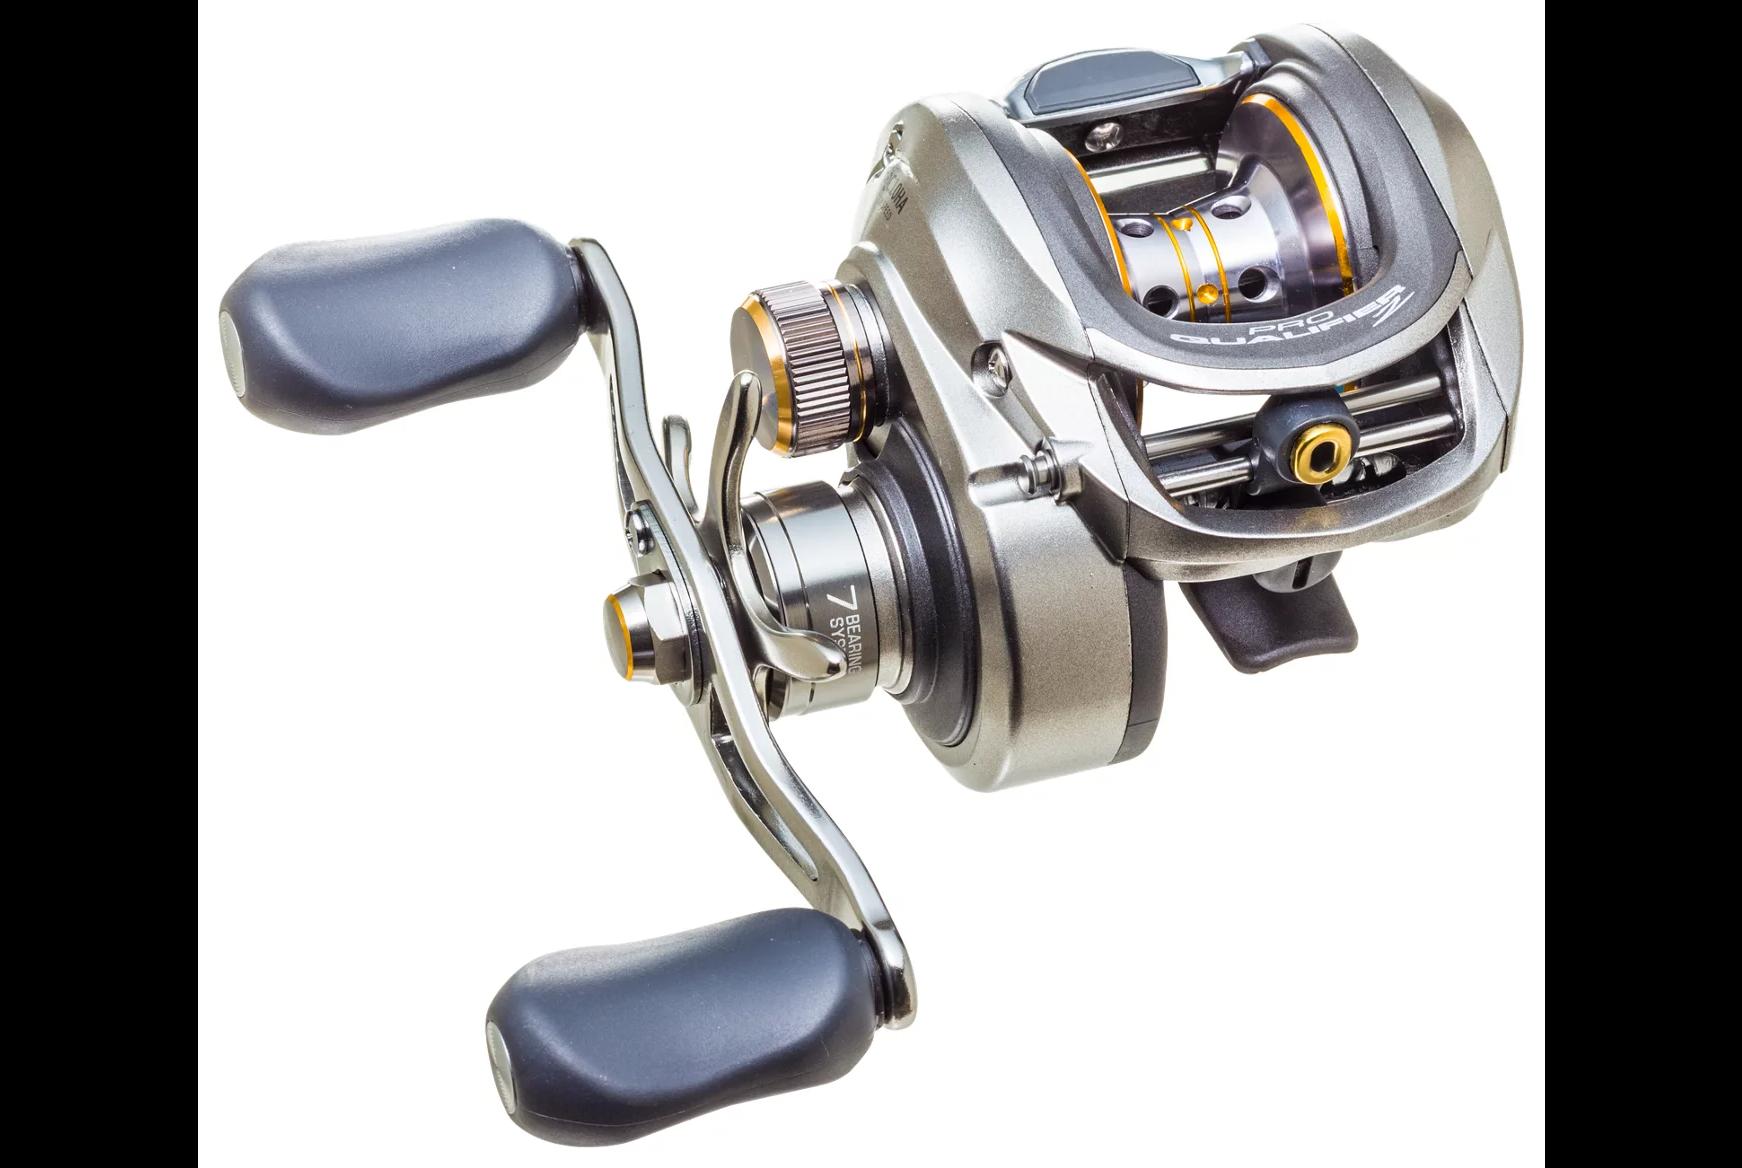 Bass Pro Shops Pro Qualifier 2 Baitcast Reel – Only $79.97